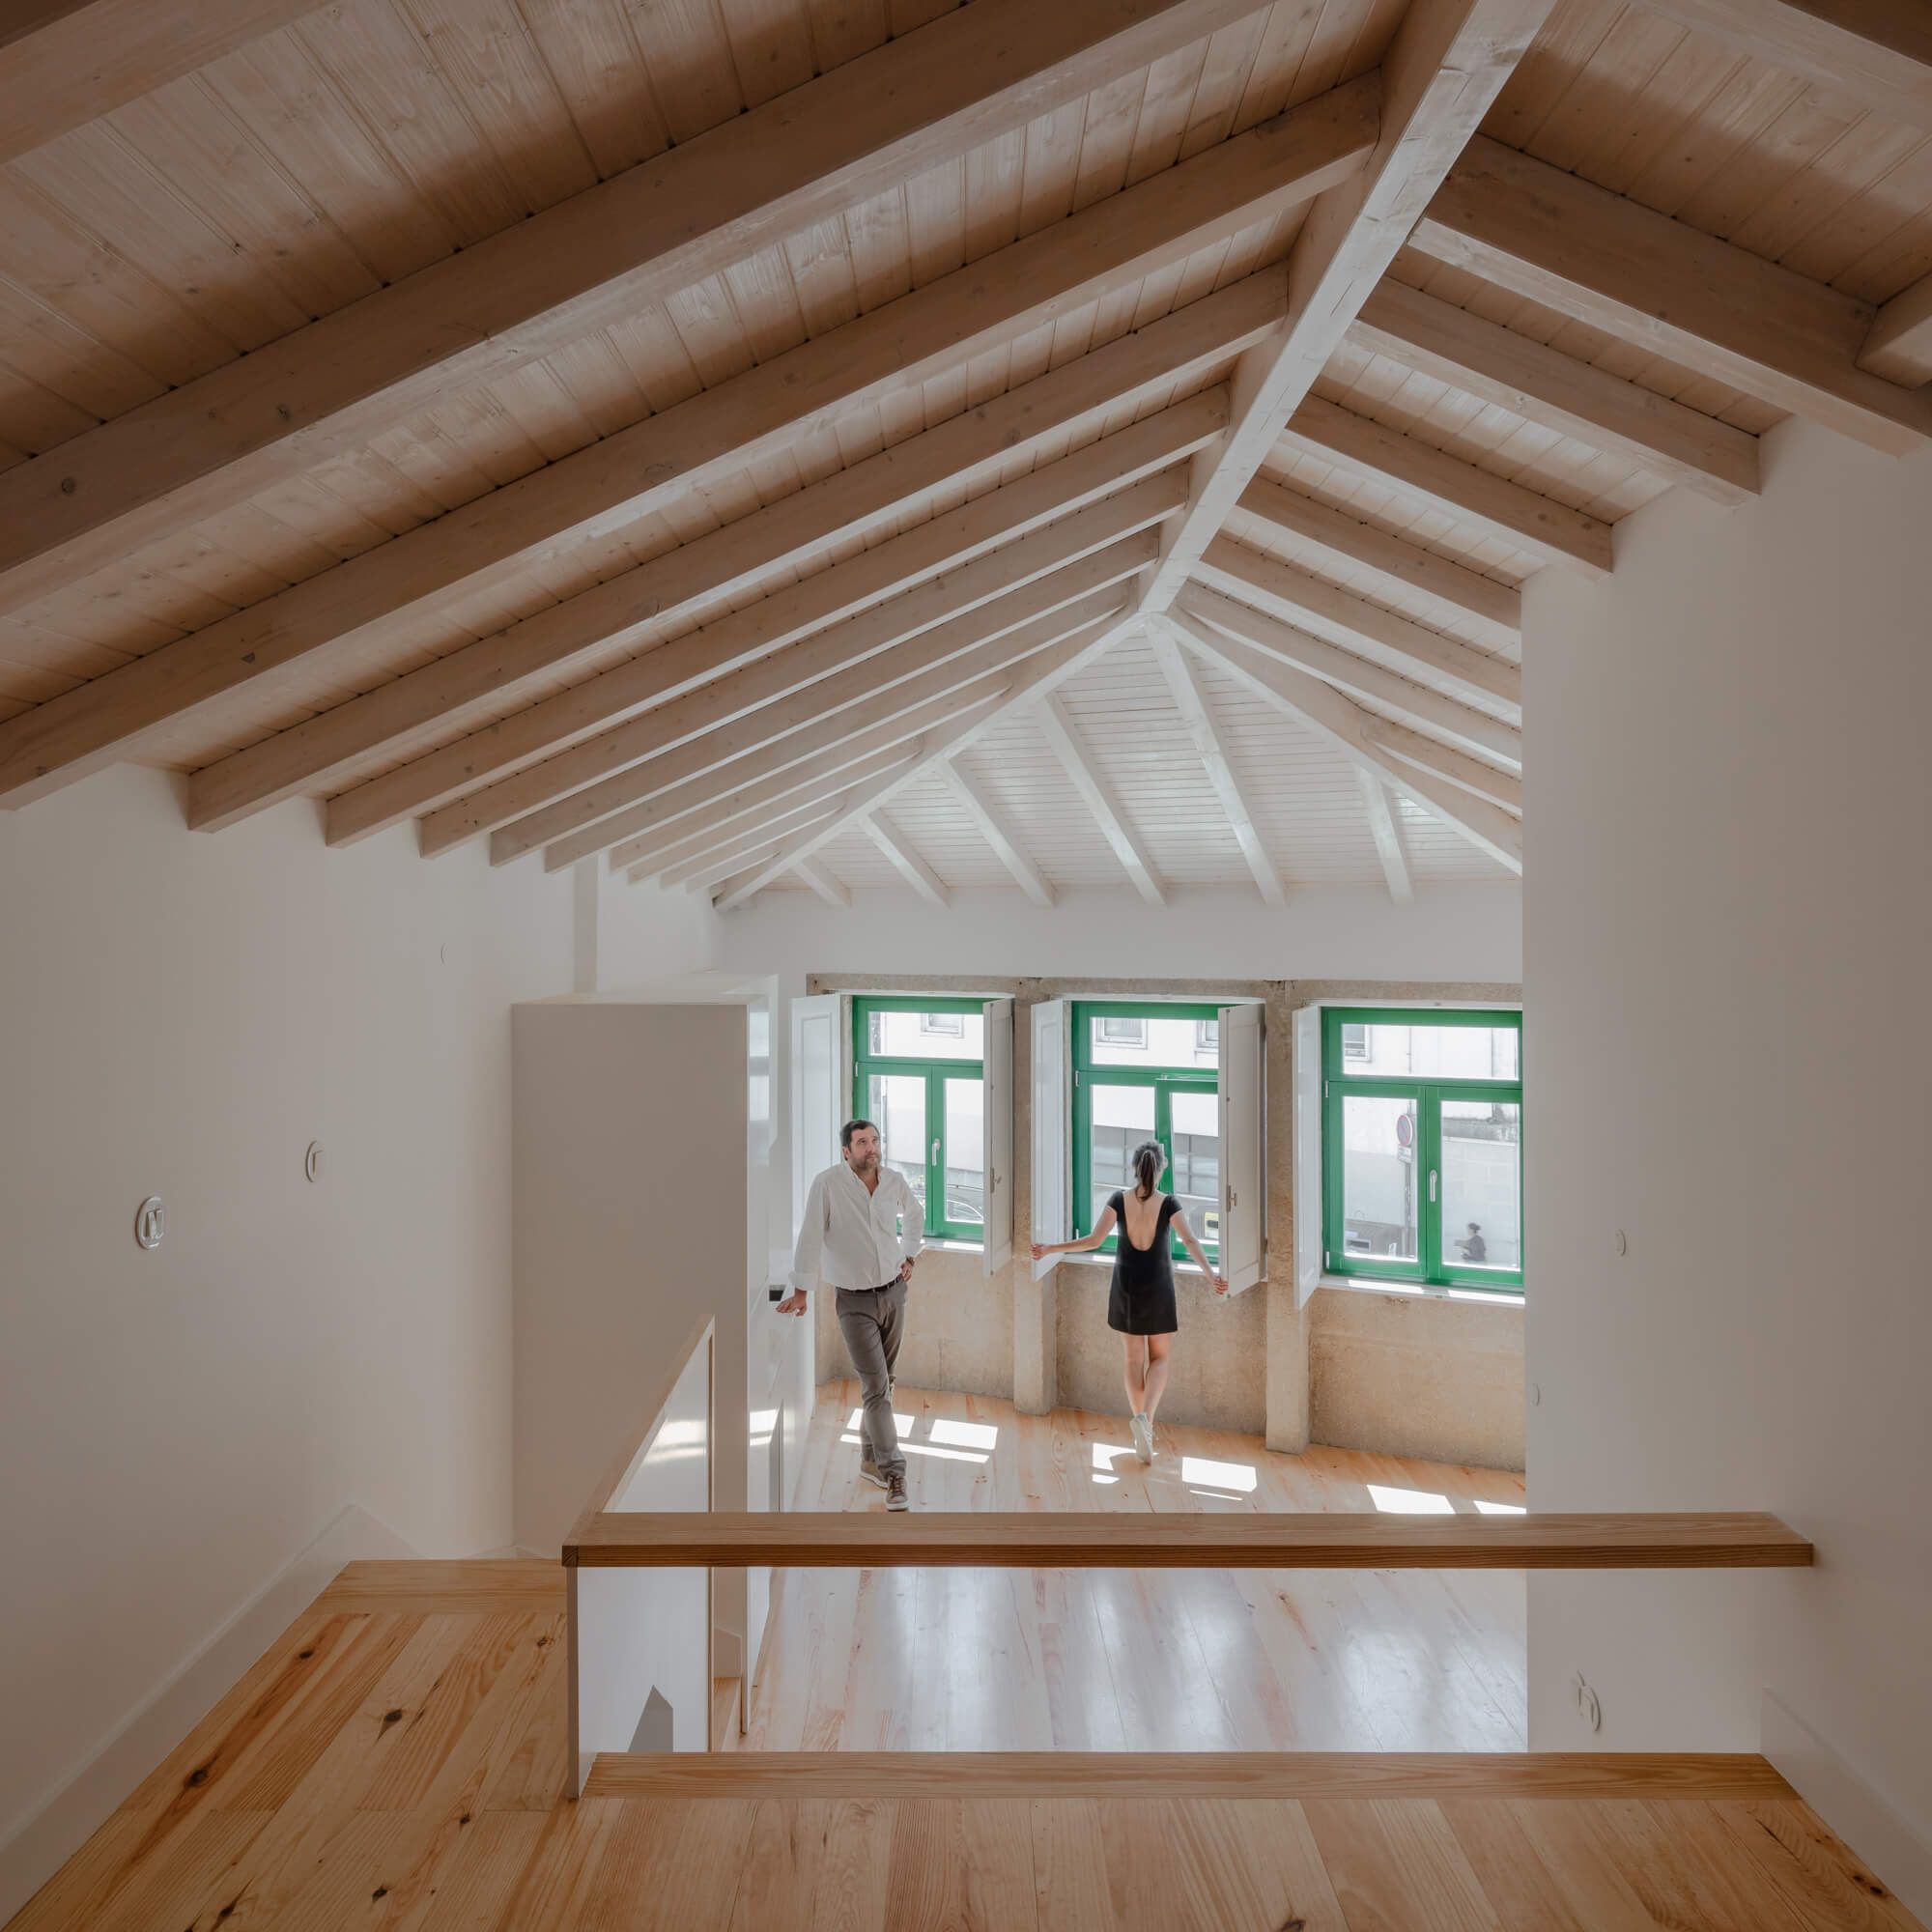 Pedro Ferreira Architecture Studio